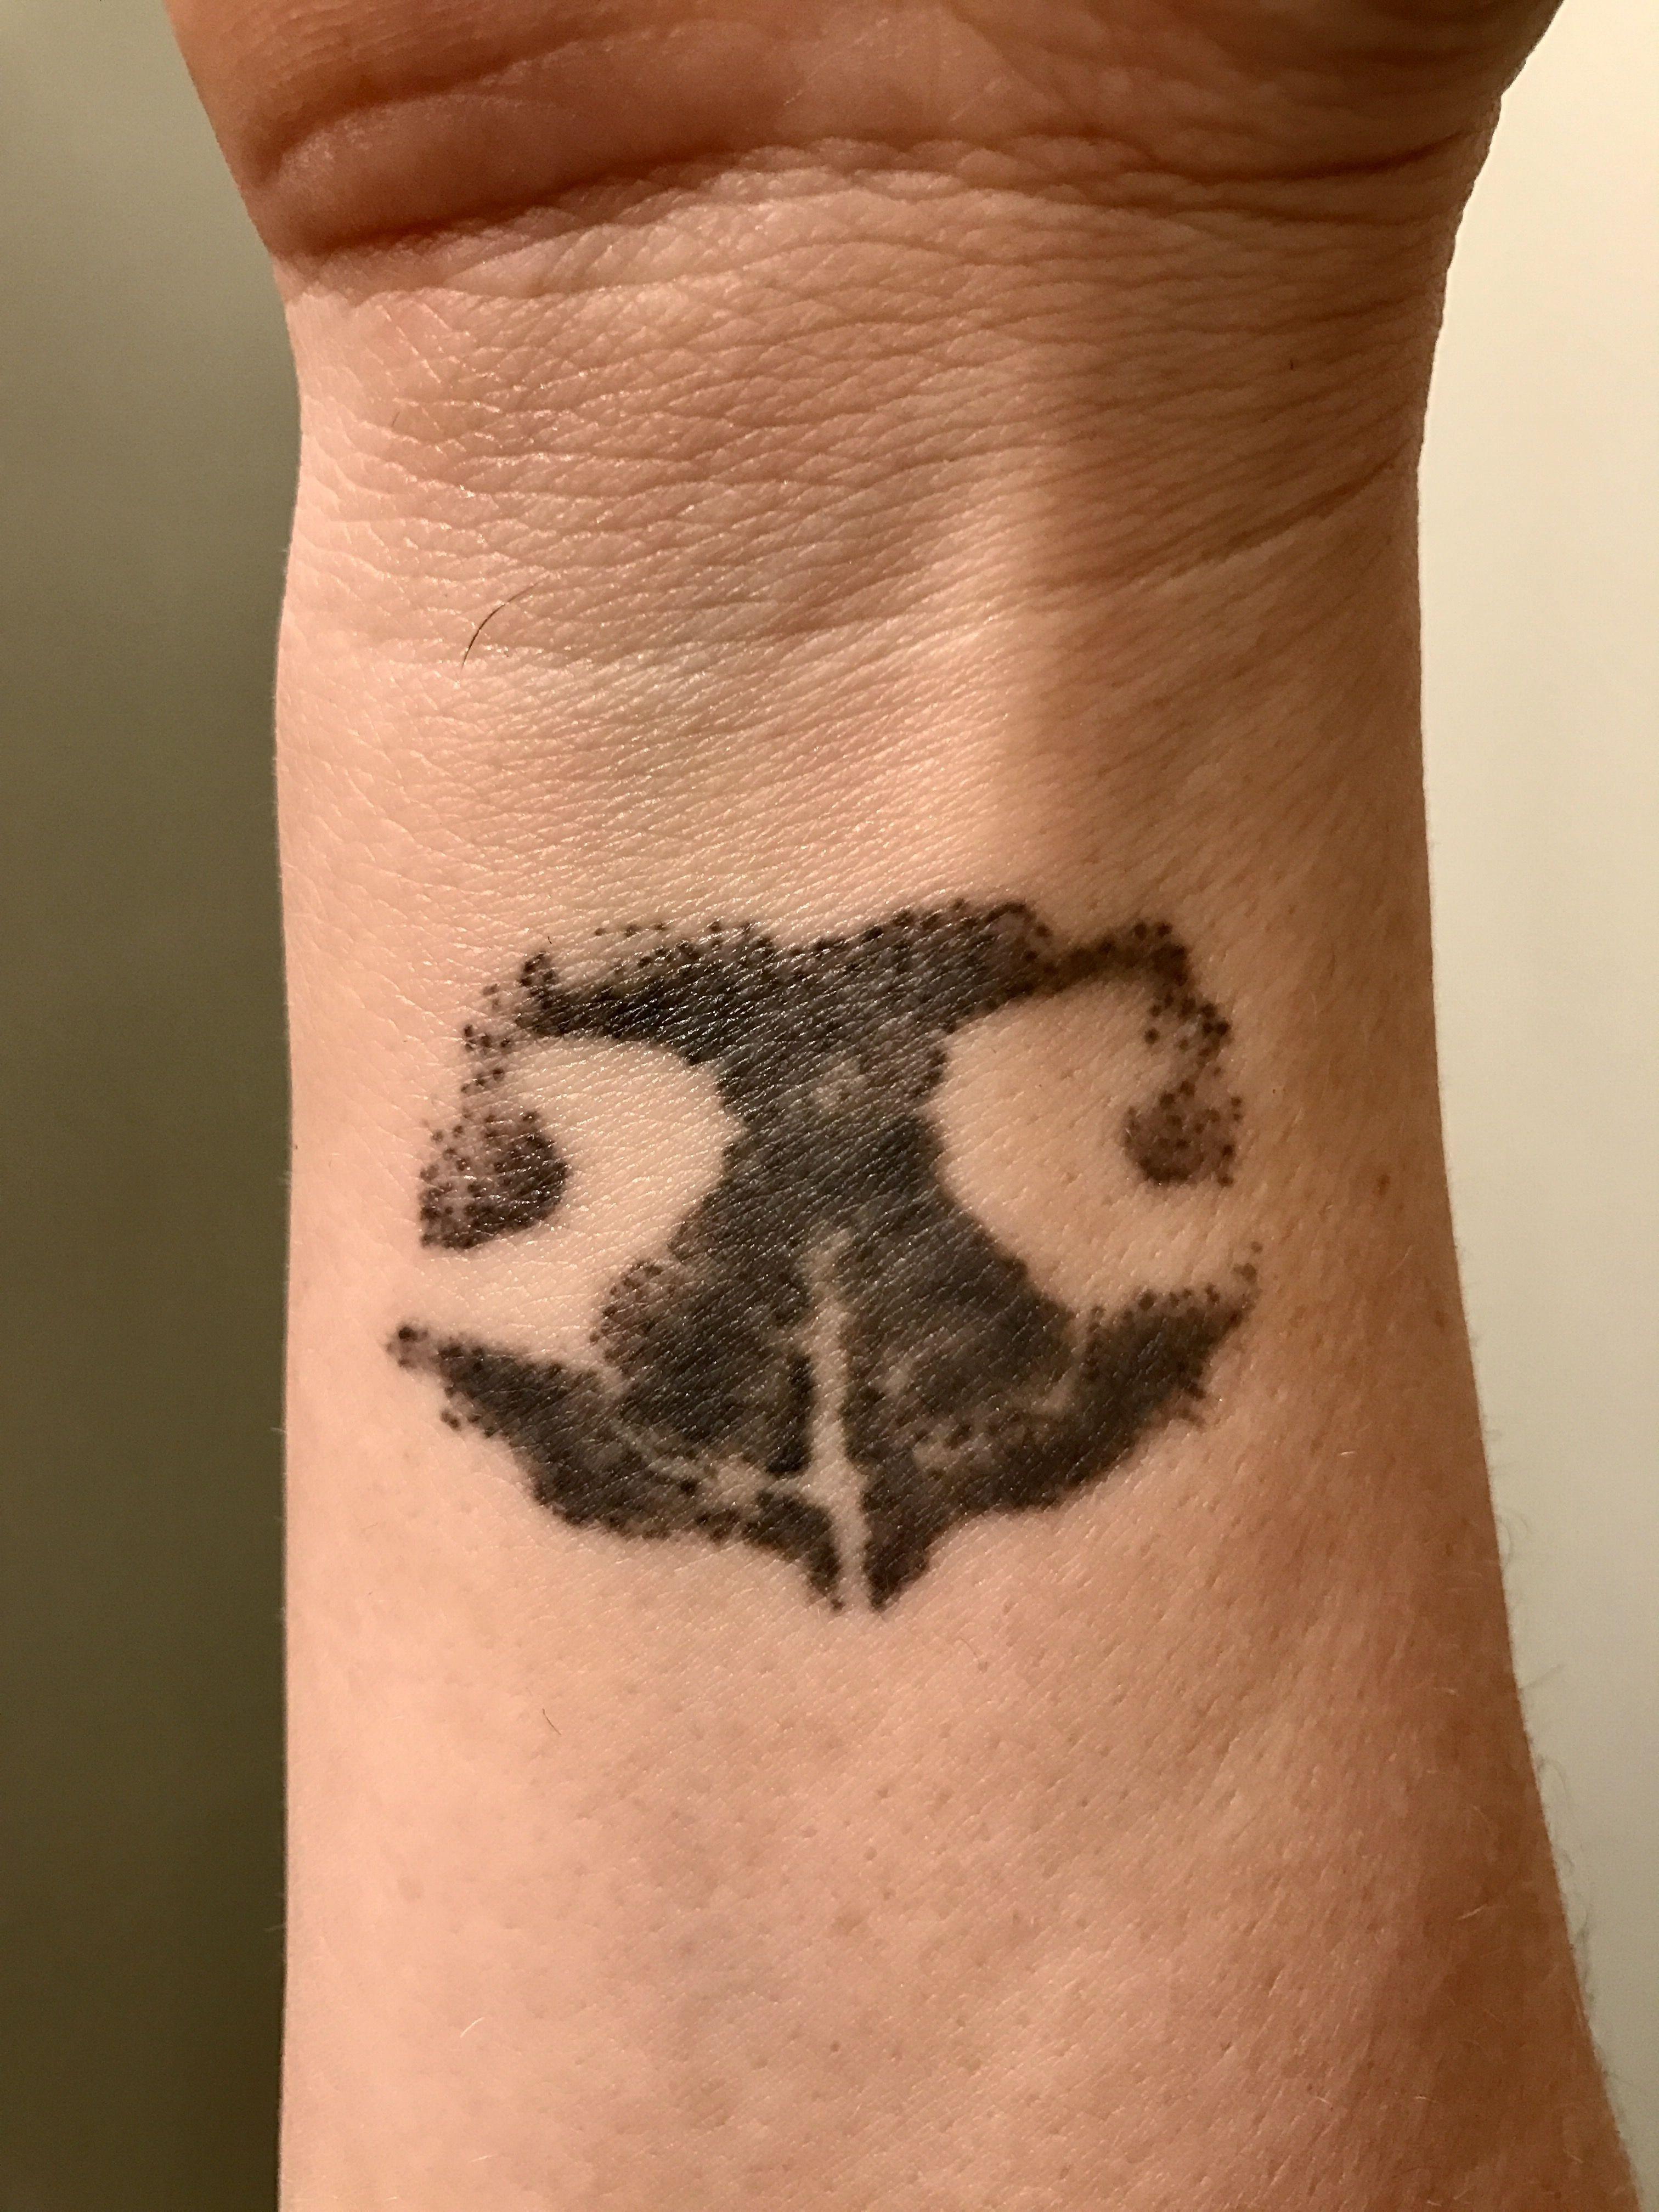 Nose print tattoo of my sweet boy dogtattooideas dog tattoo ideas